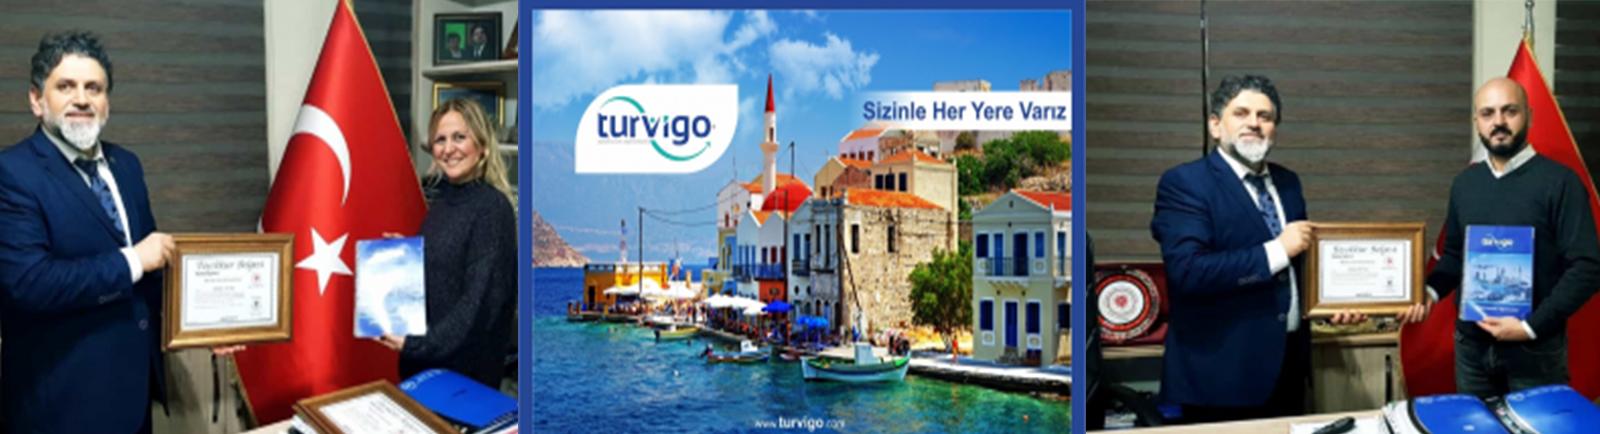 Turvigo İle Turizm Daha Güzel